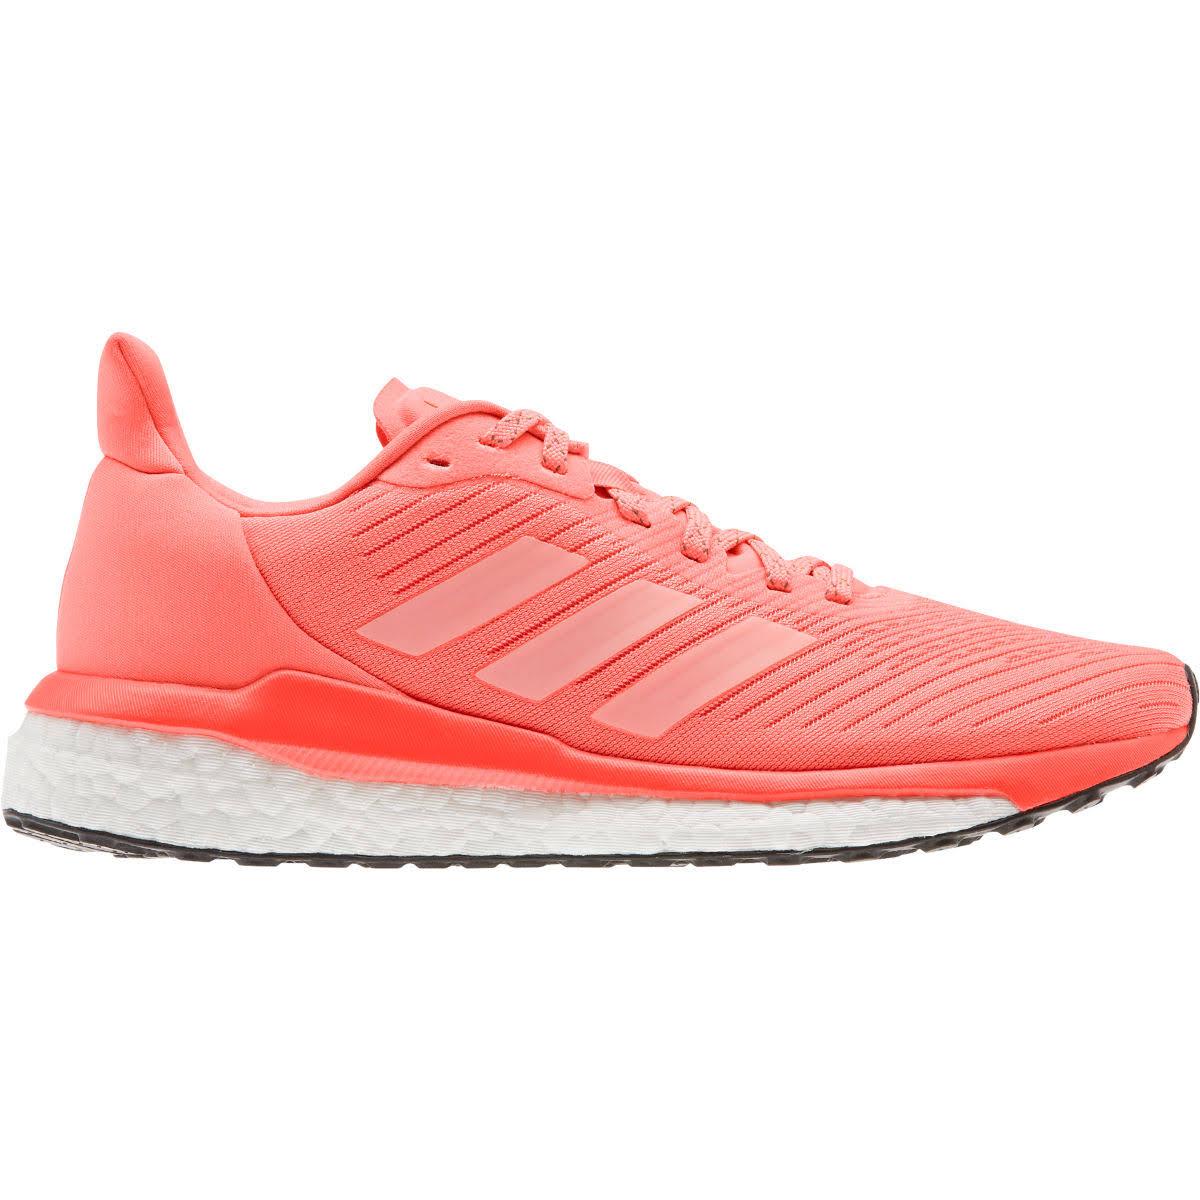 Adidas Solar Drive 19 Women's Running Shoes - Pink - 4.5